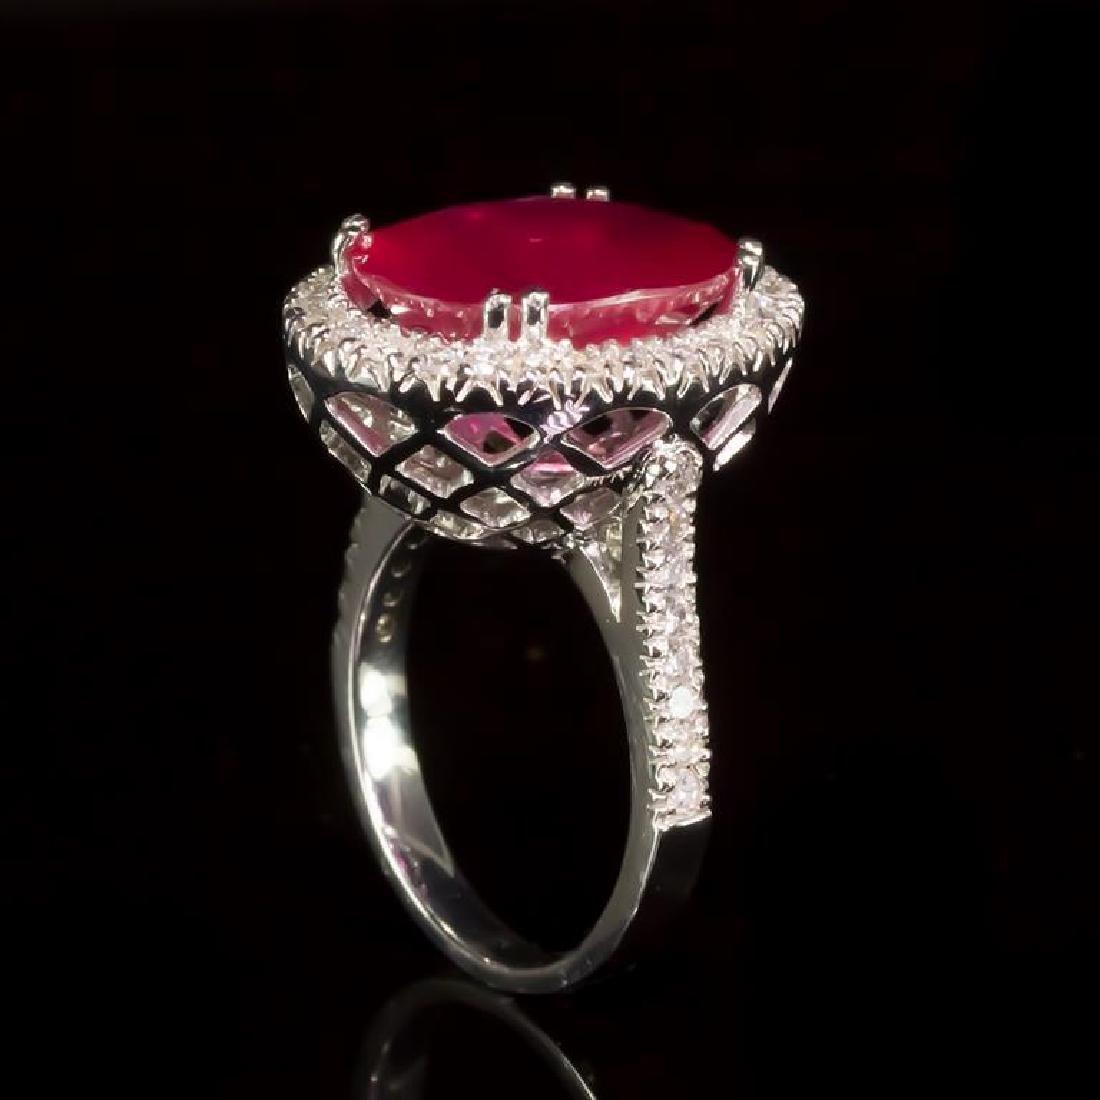 14k Gold 8.94ct Ruby 0.85ct Diamond Ring - 3